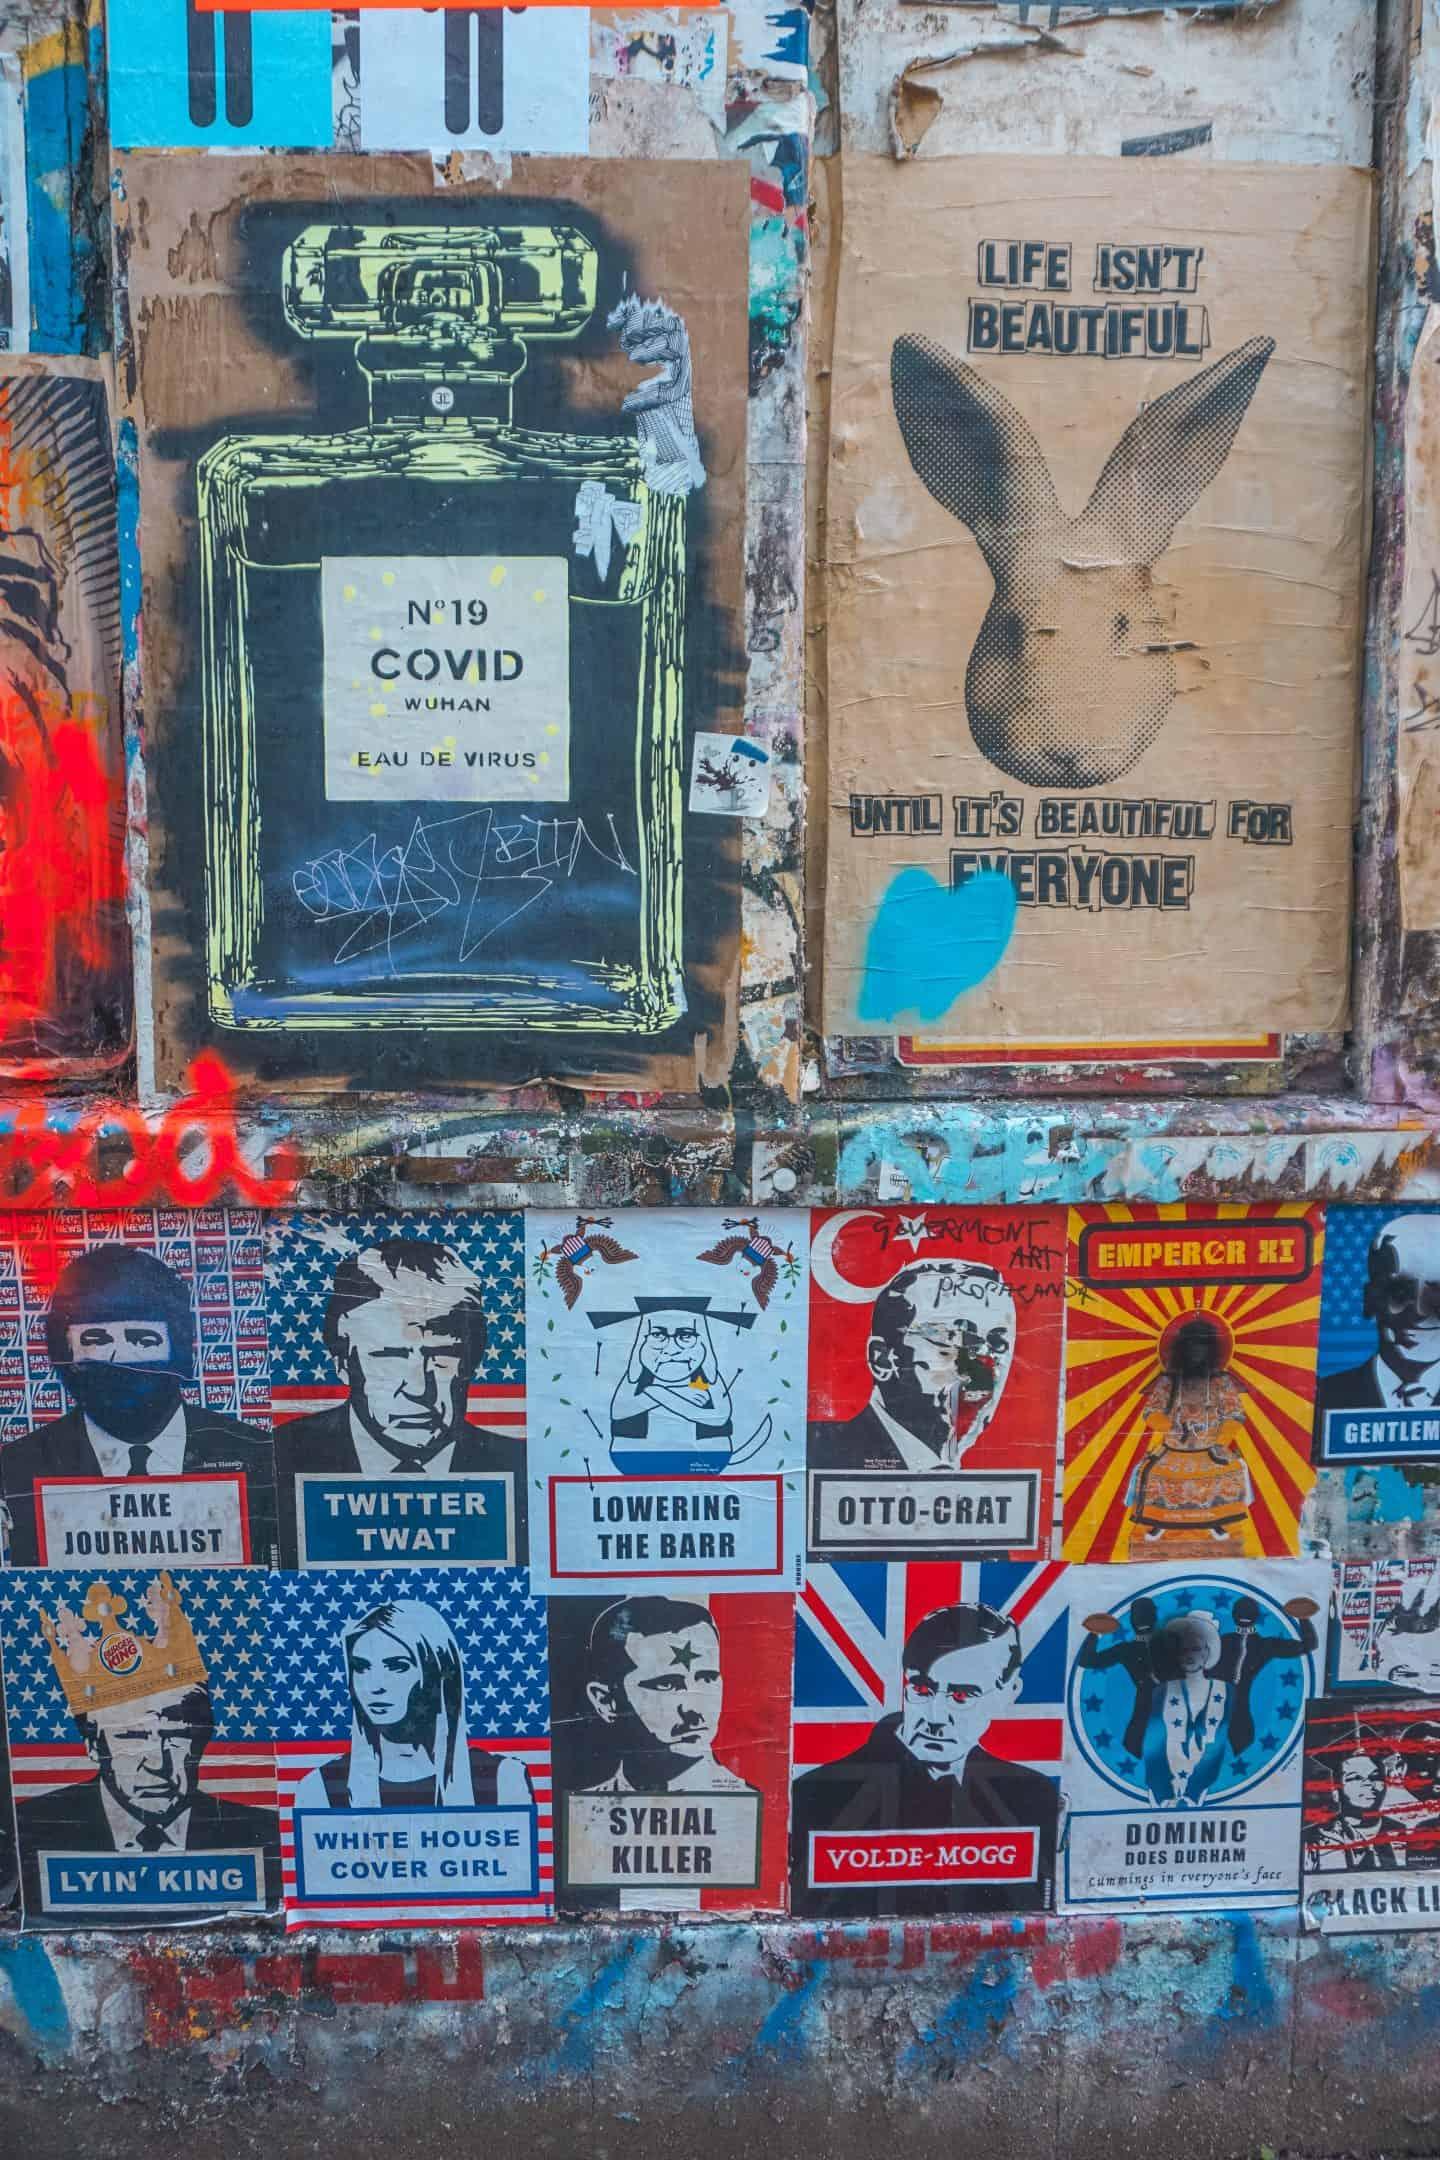 Wall-of-street-art-brick-lane